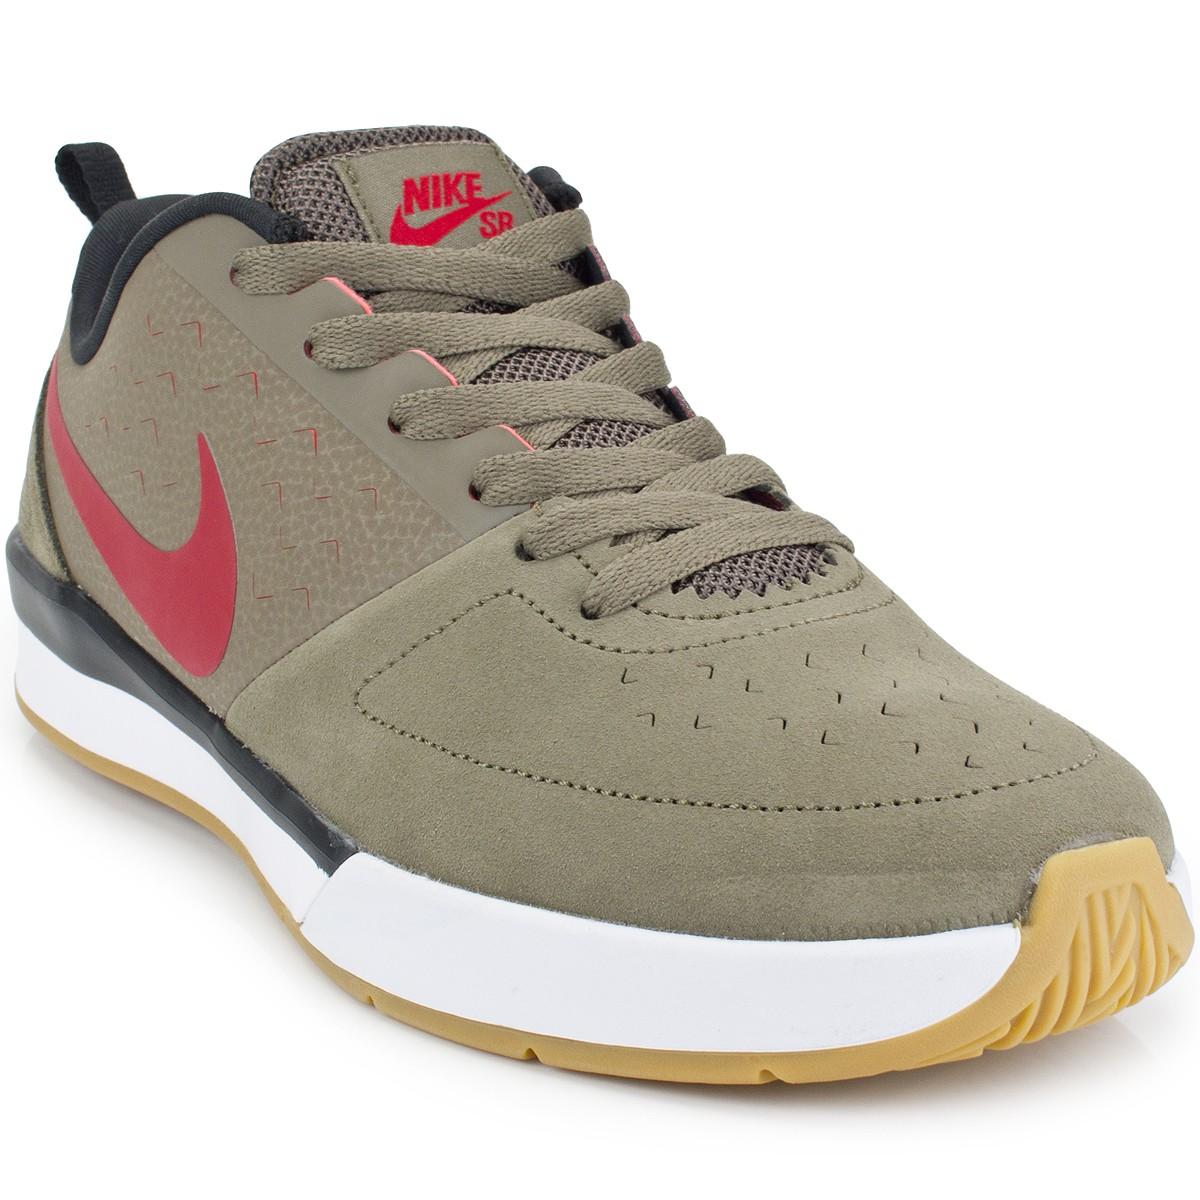 ddecc05c28a8 Tênis Nike SB Ghost 654432